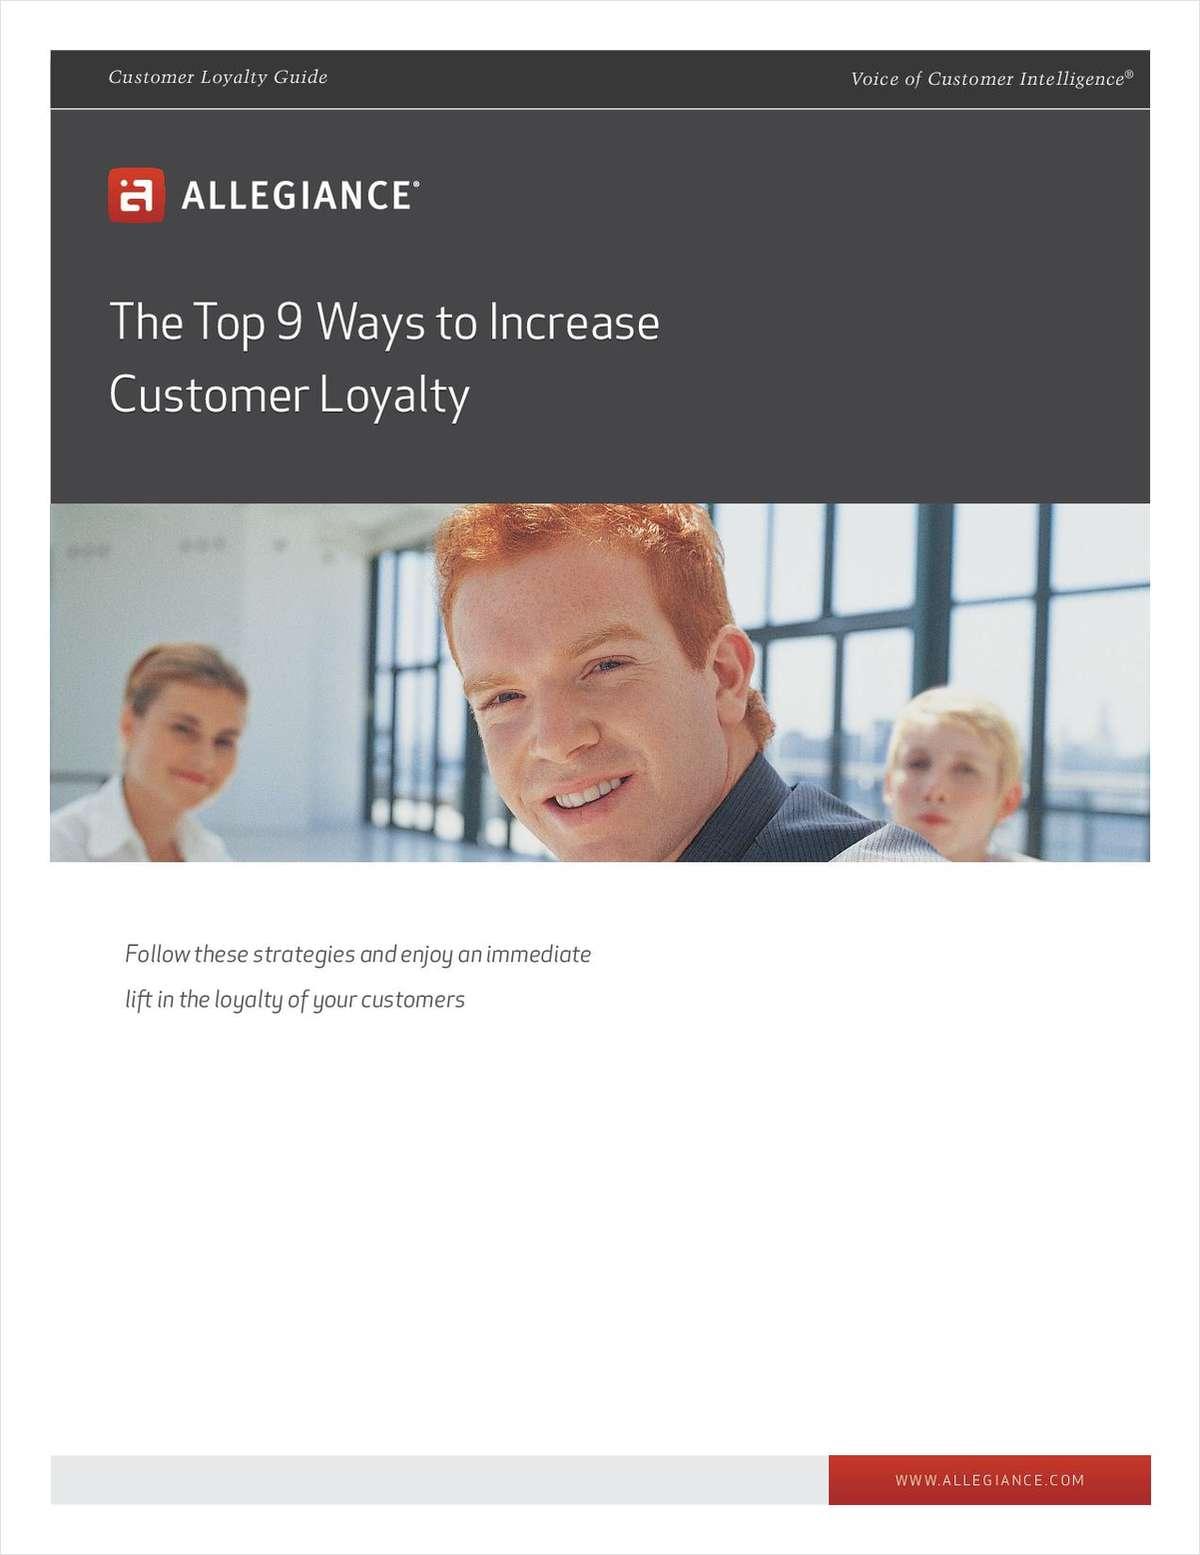 Top 9 Ways to Increase Customer Loyalty